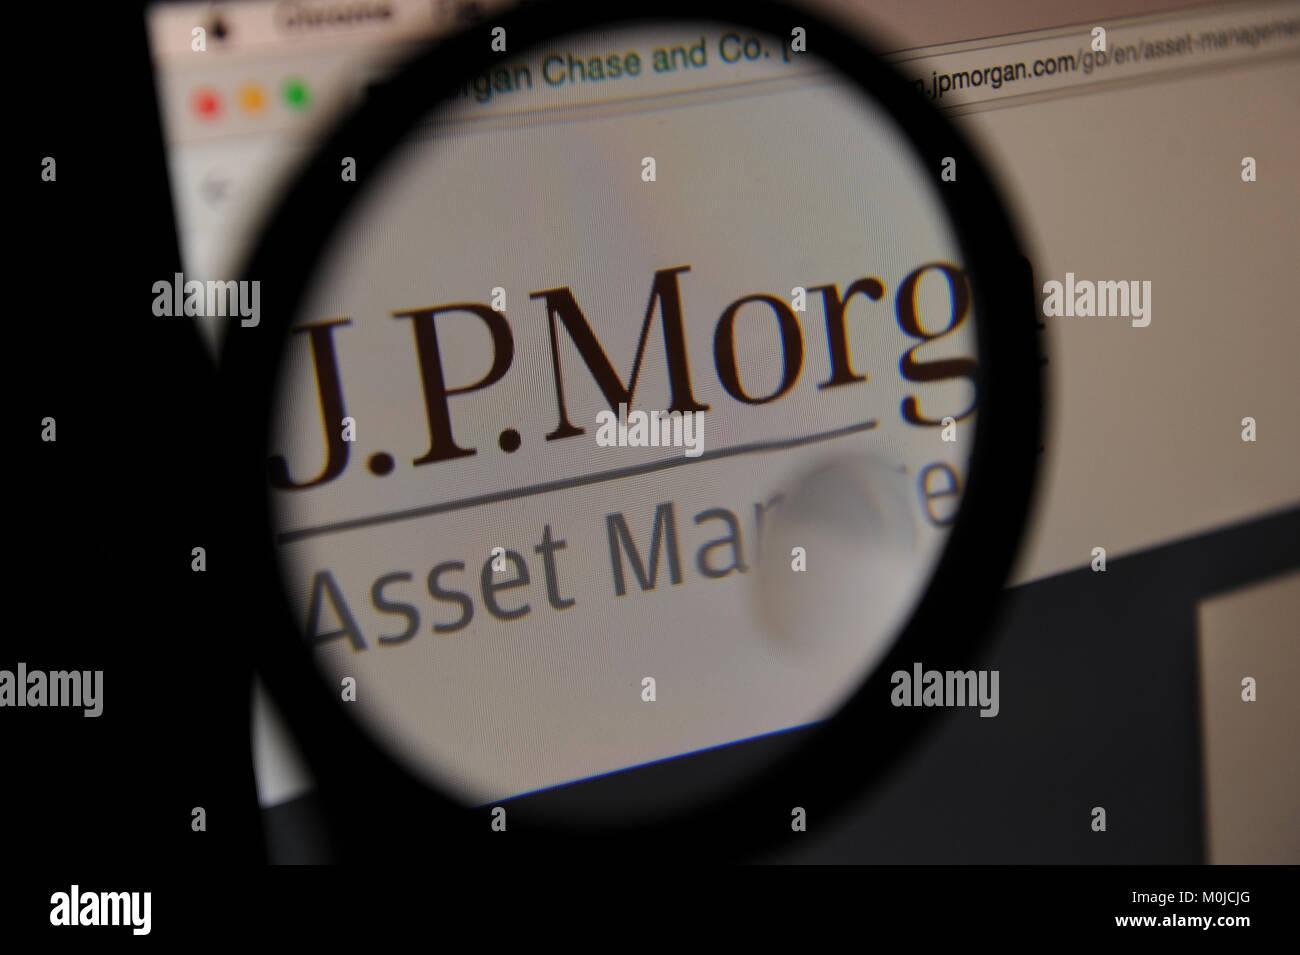 JP Morgan Stock Photo